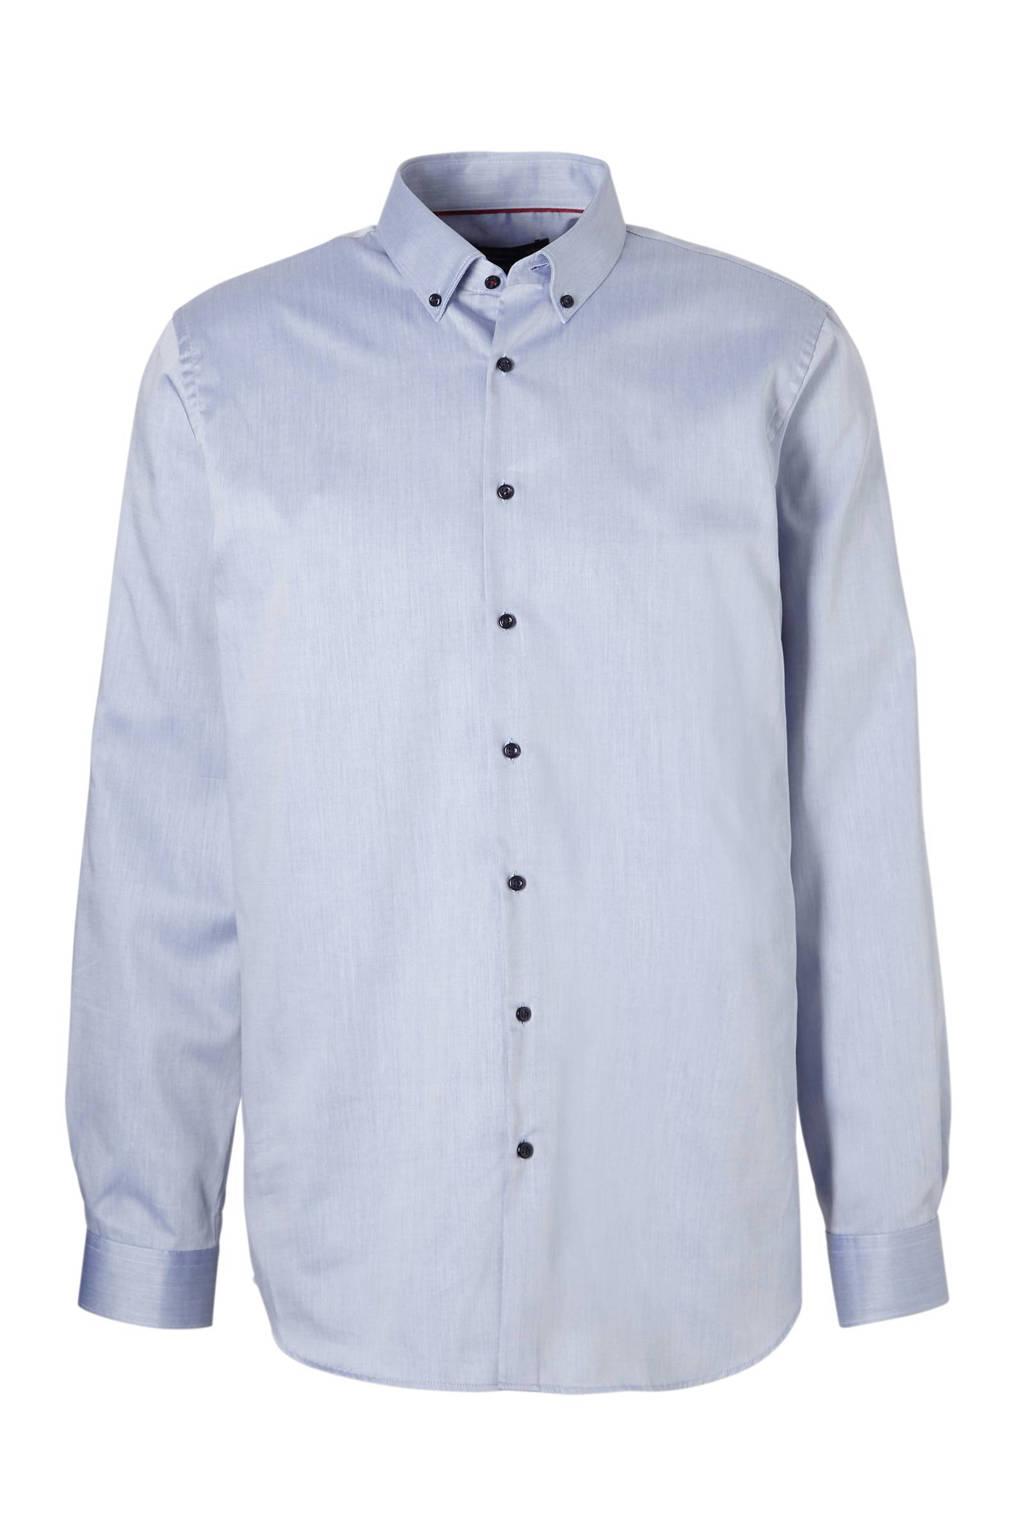 Overhemd Blauw.C A Angelo Litrico Slim Fit Overhemd Blauw Wehkamp